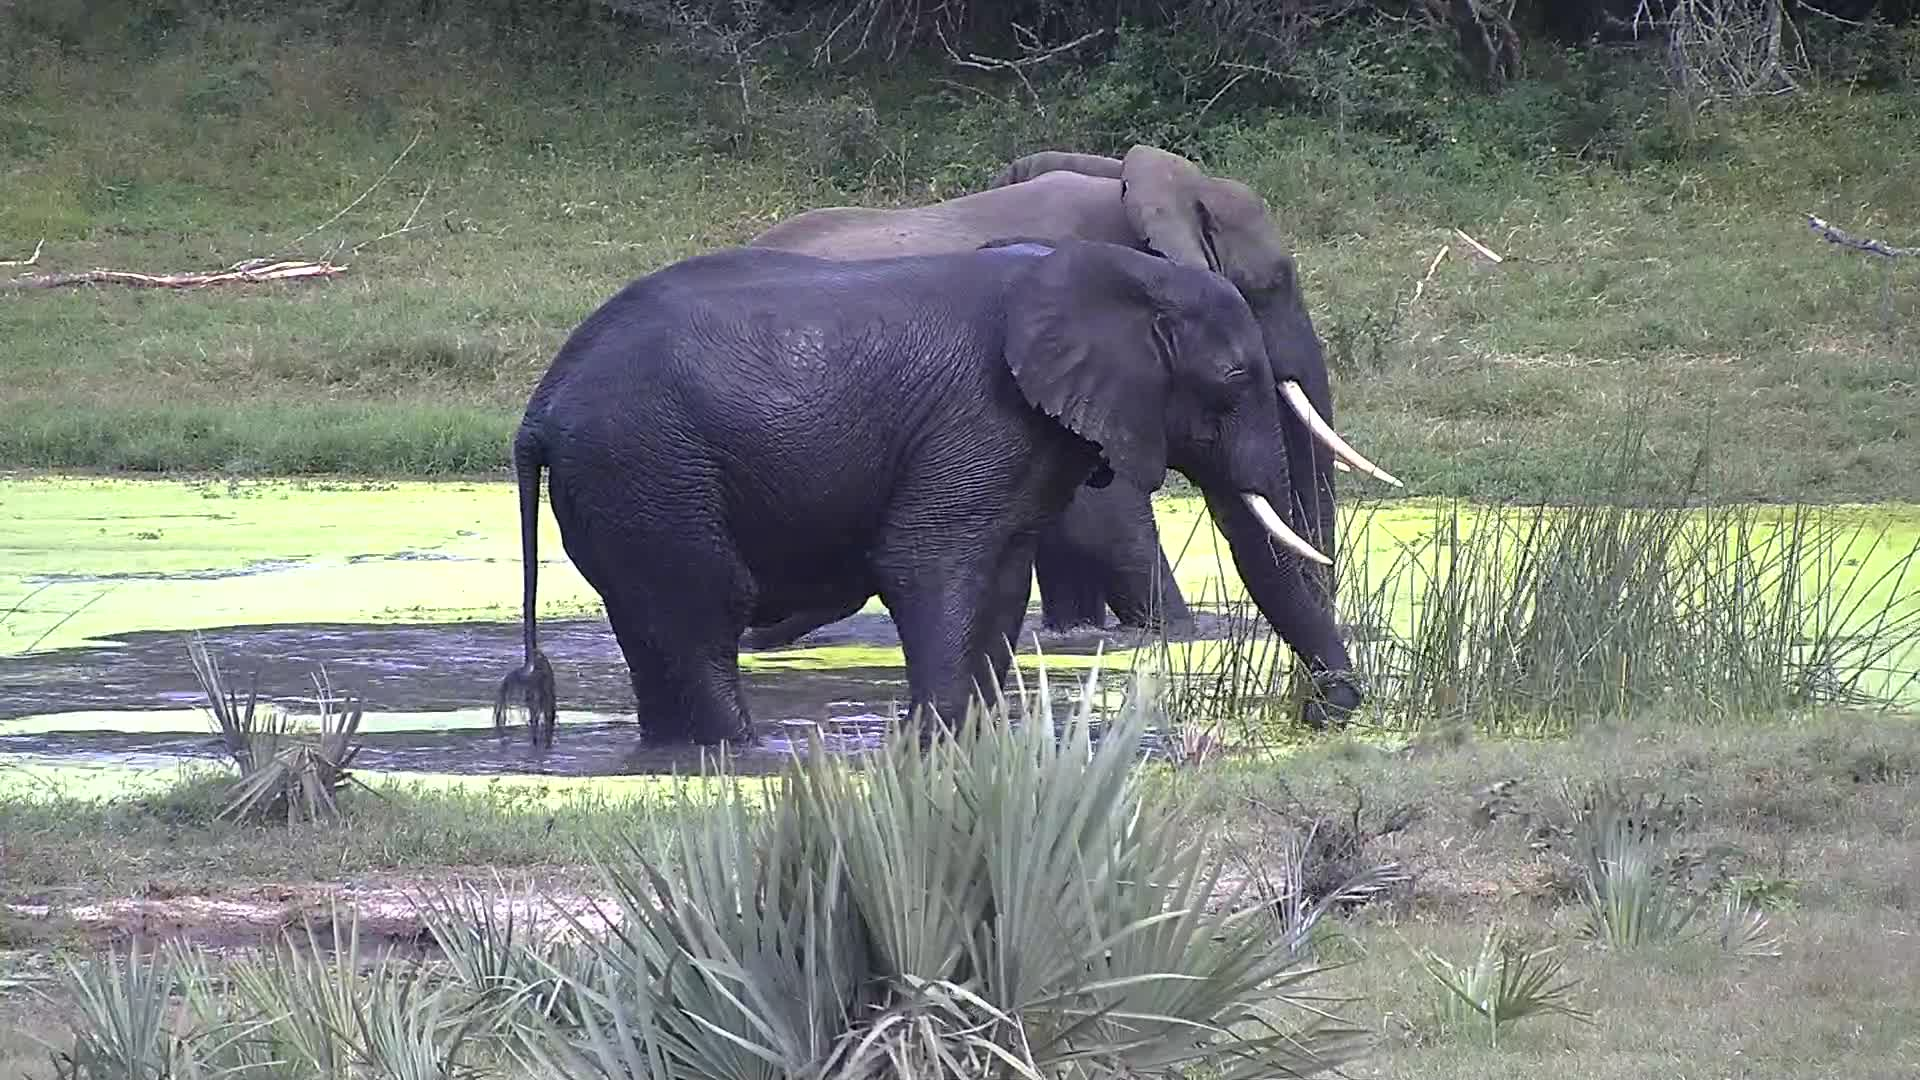 VIDEO: Elephants having fun in the water.